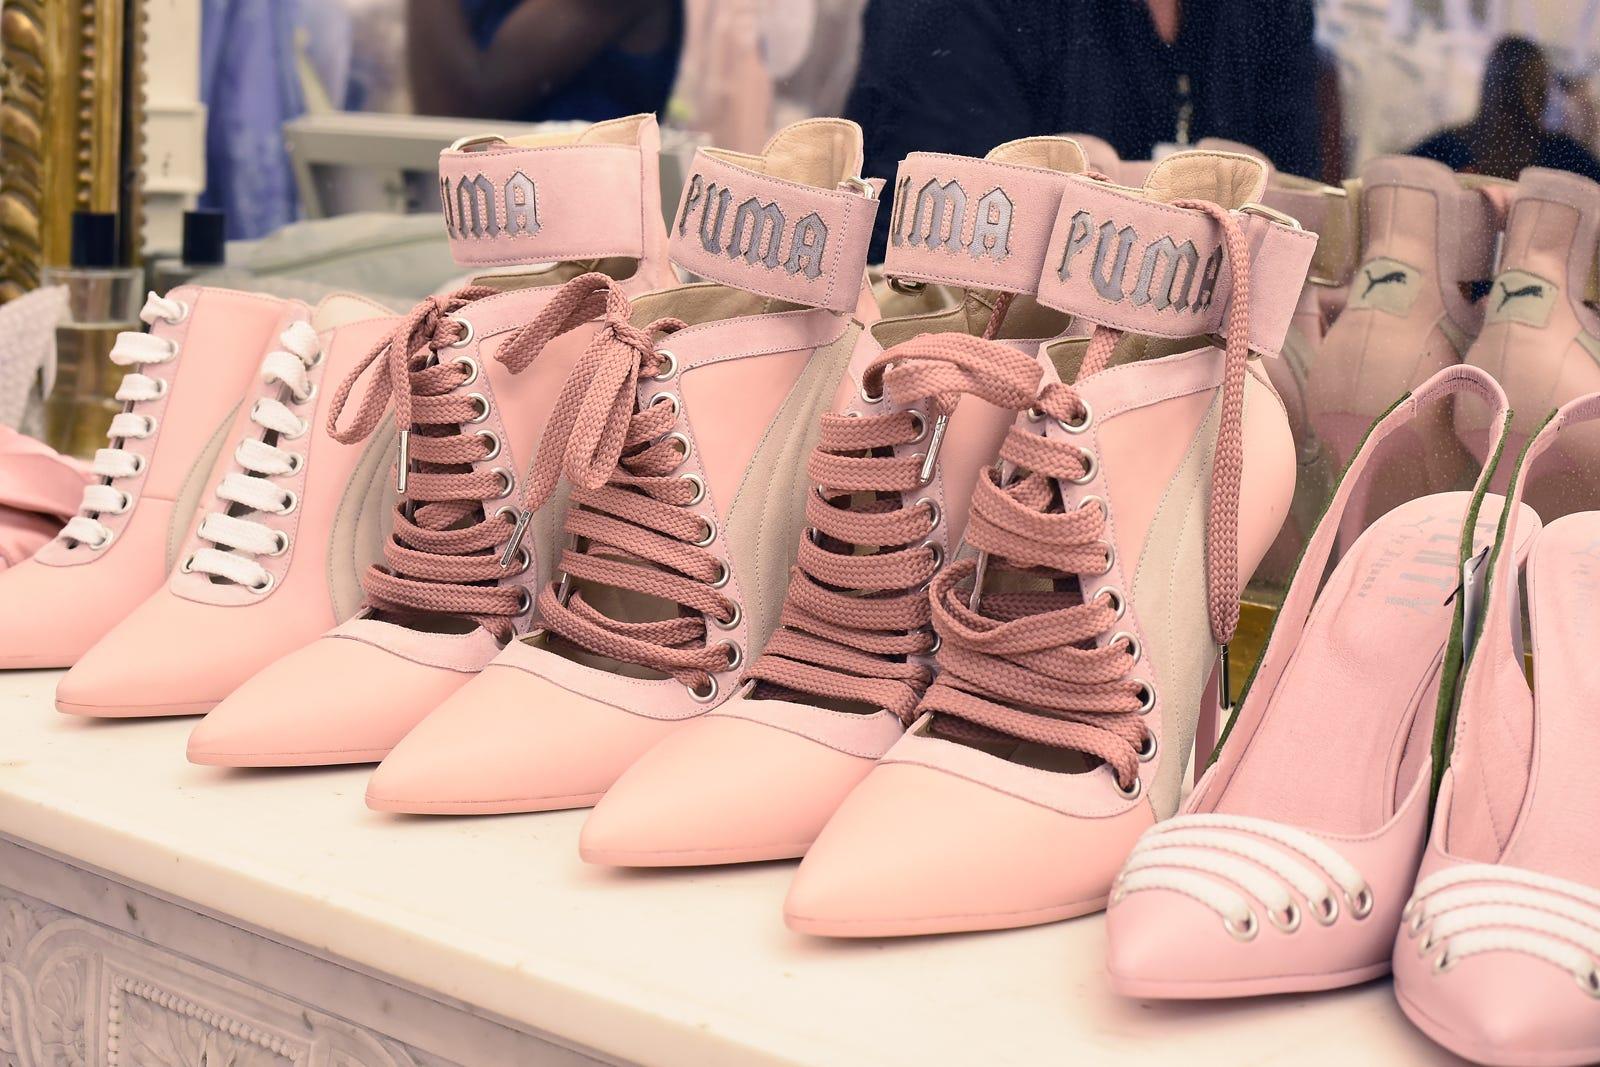 Rihanna Fenty Spring 2017 Puma Shoes Paris Fashion Week 2932e72c6